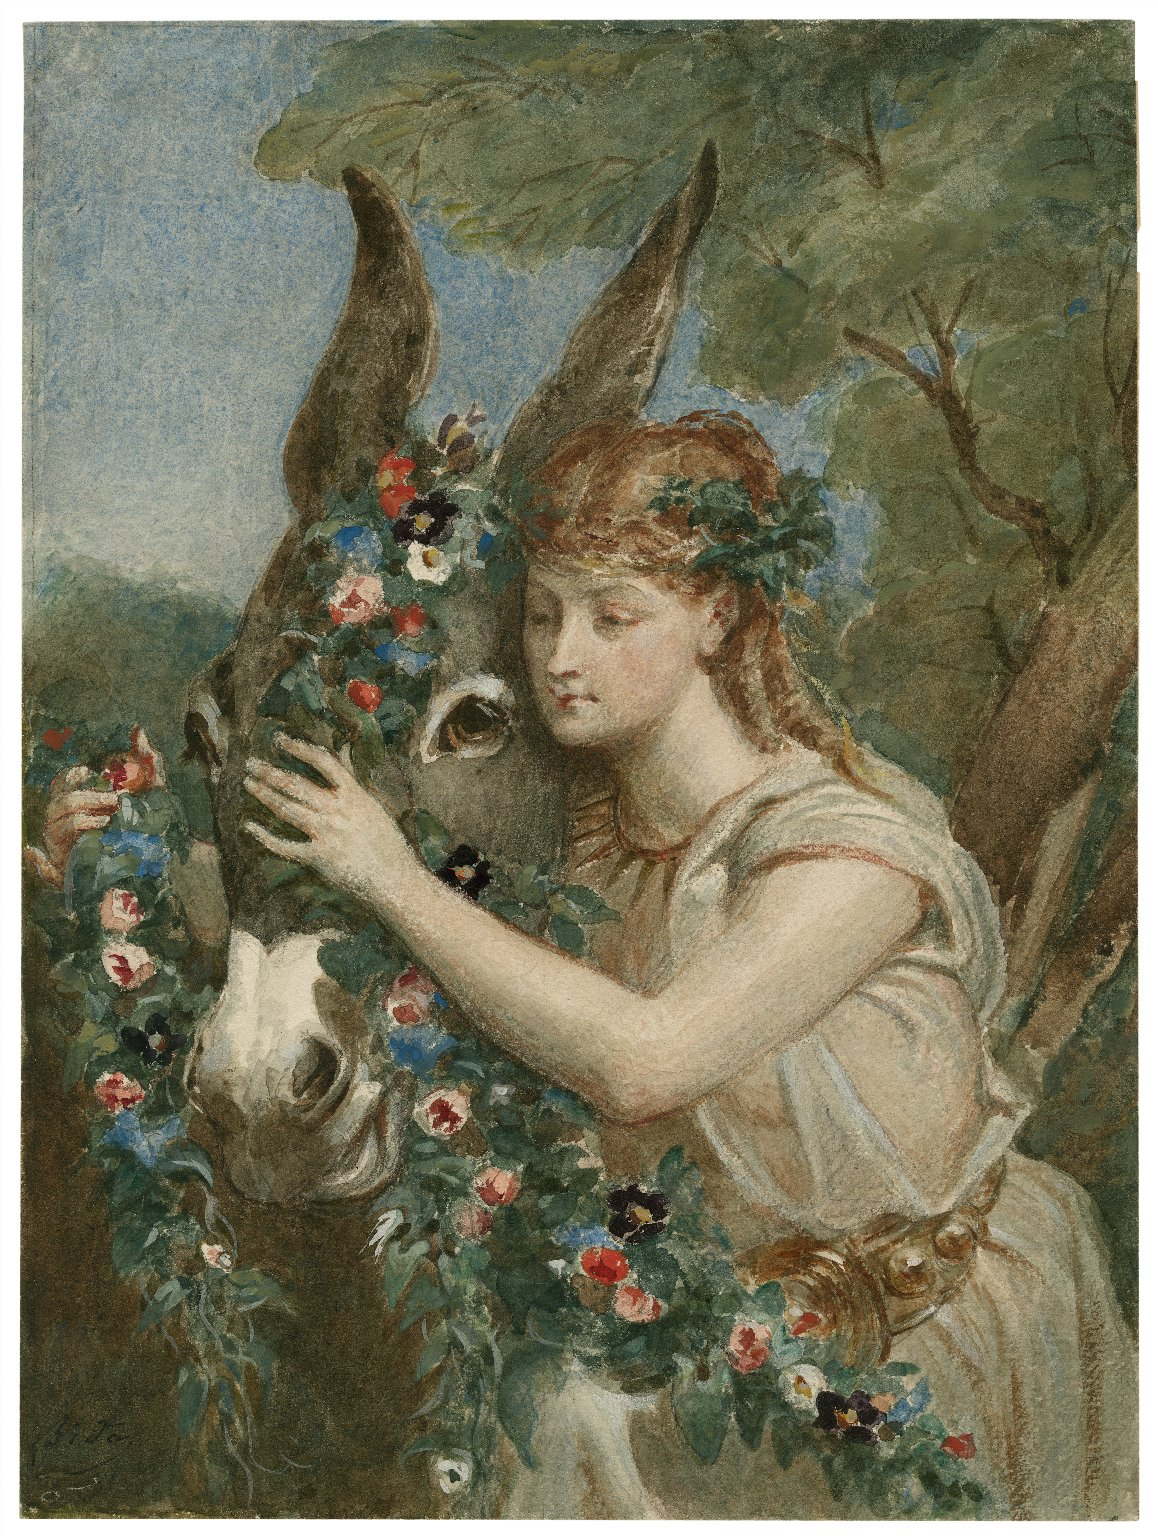 [Midsummer night's dream, IV, 1, Titania adorns Bottom with flowers] [graphic] / [Alexandre Bida ...